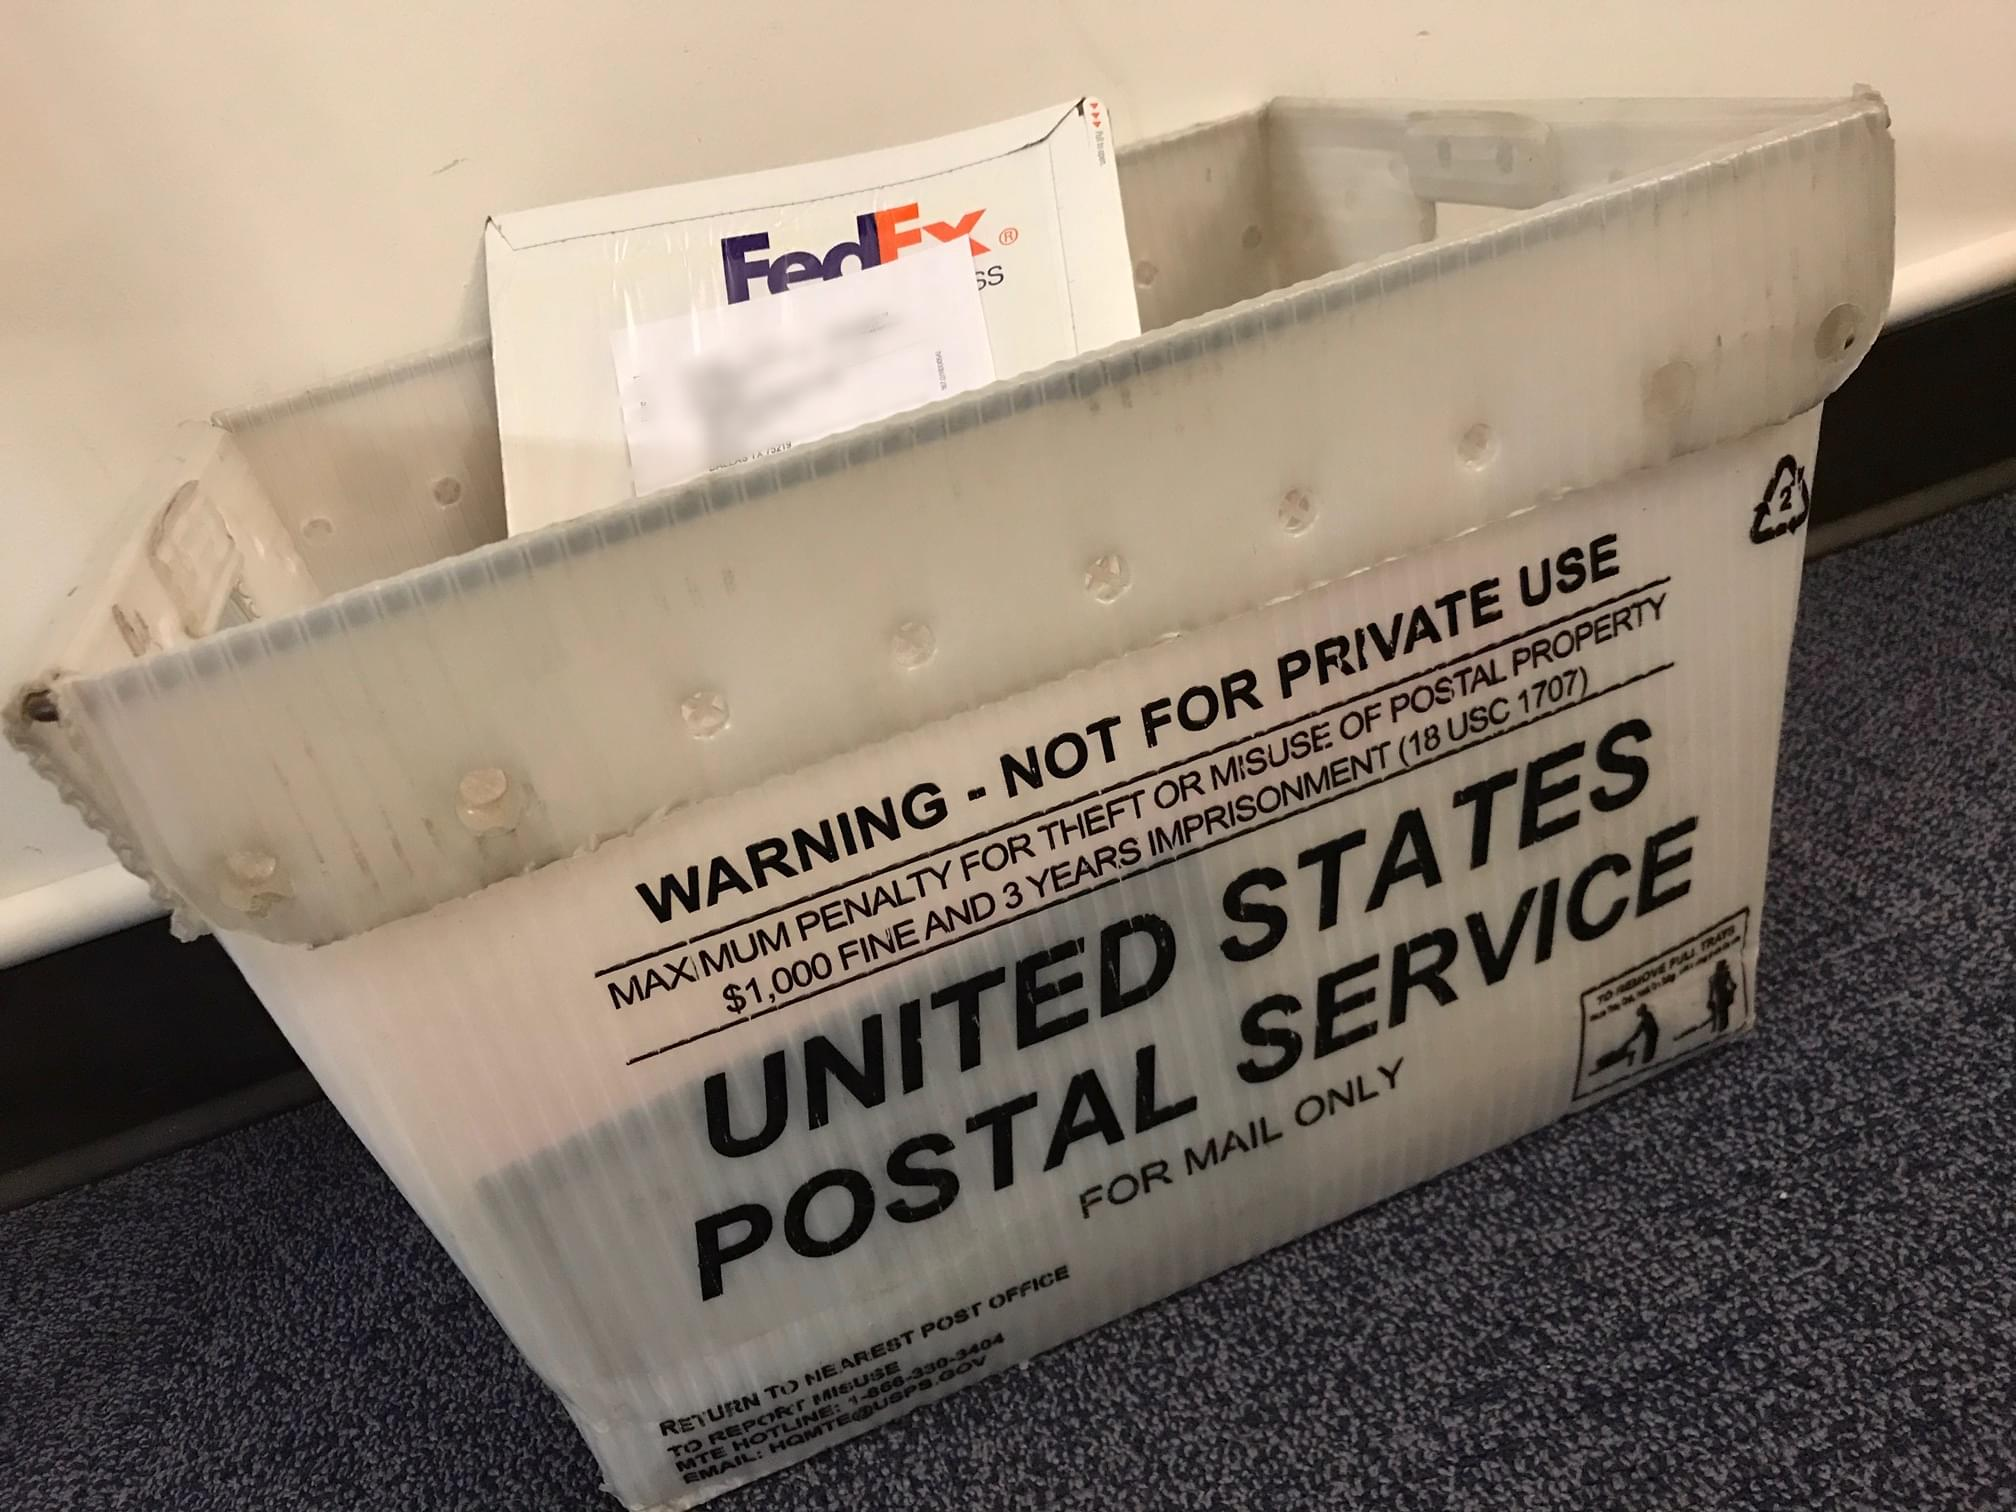 Shipping Deadlines for Christmas